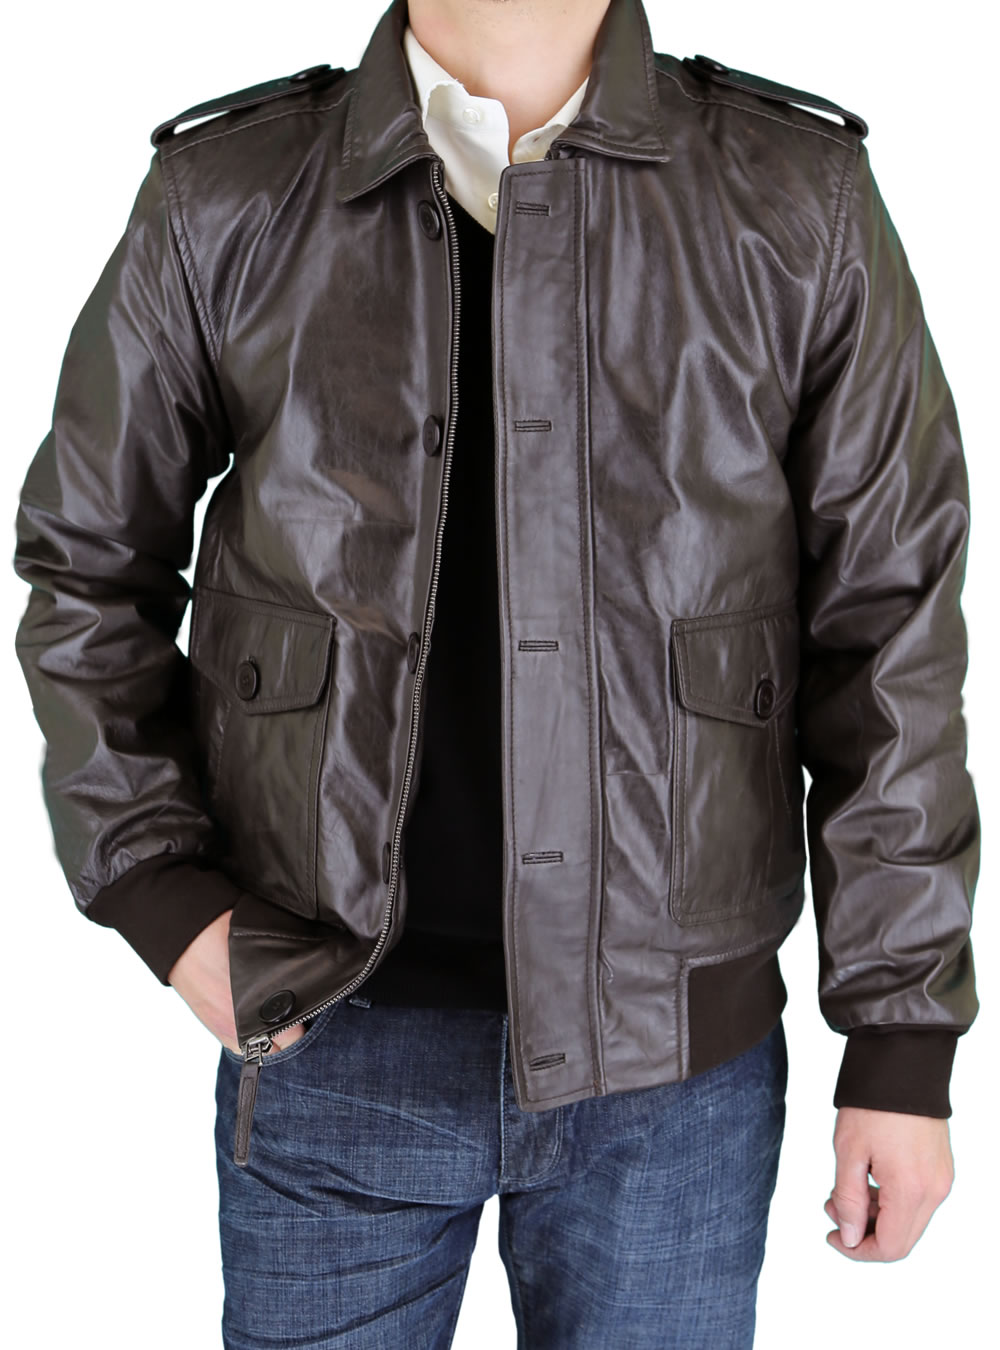 Fine Men/'s Leather Jacket